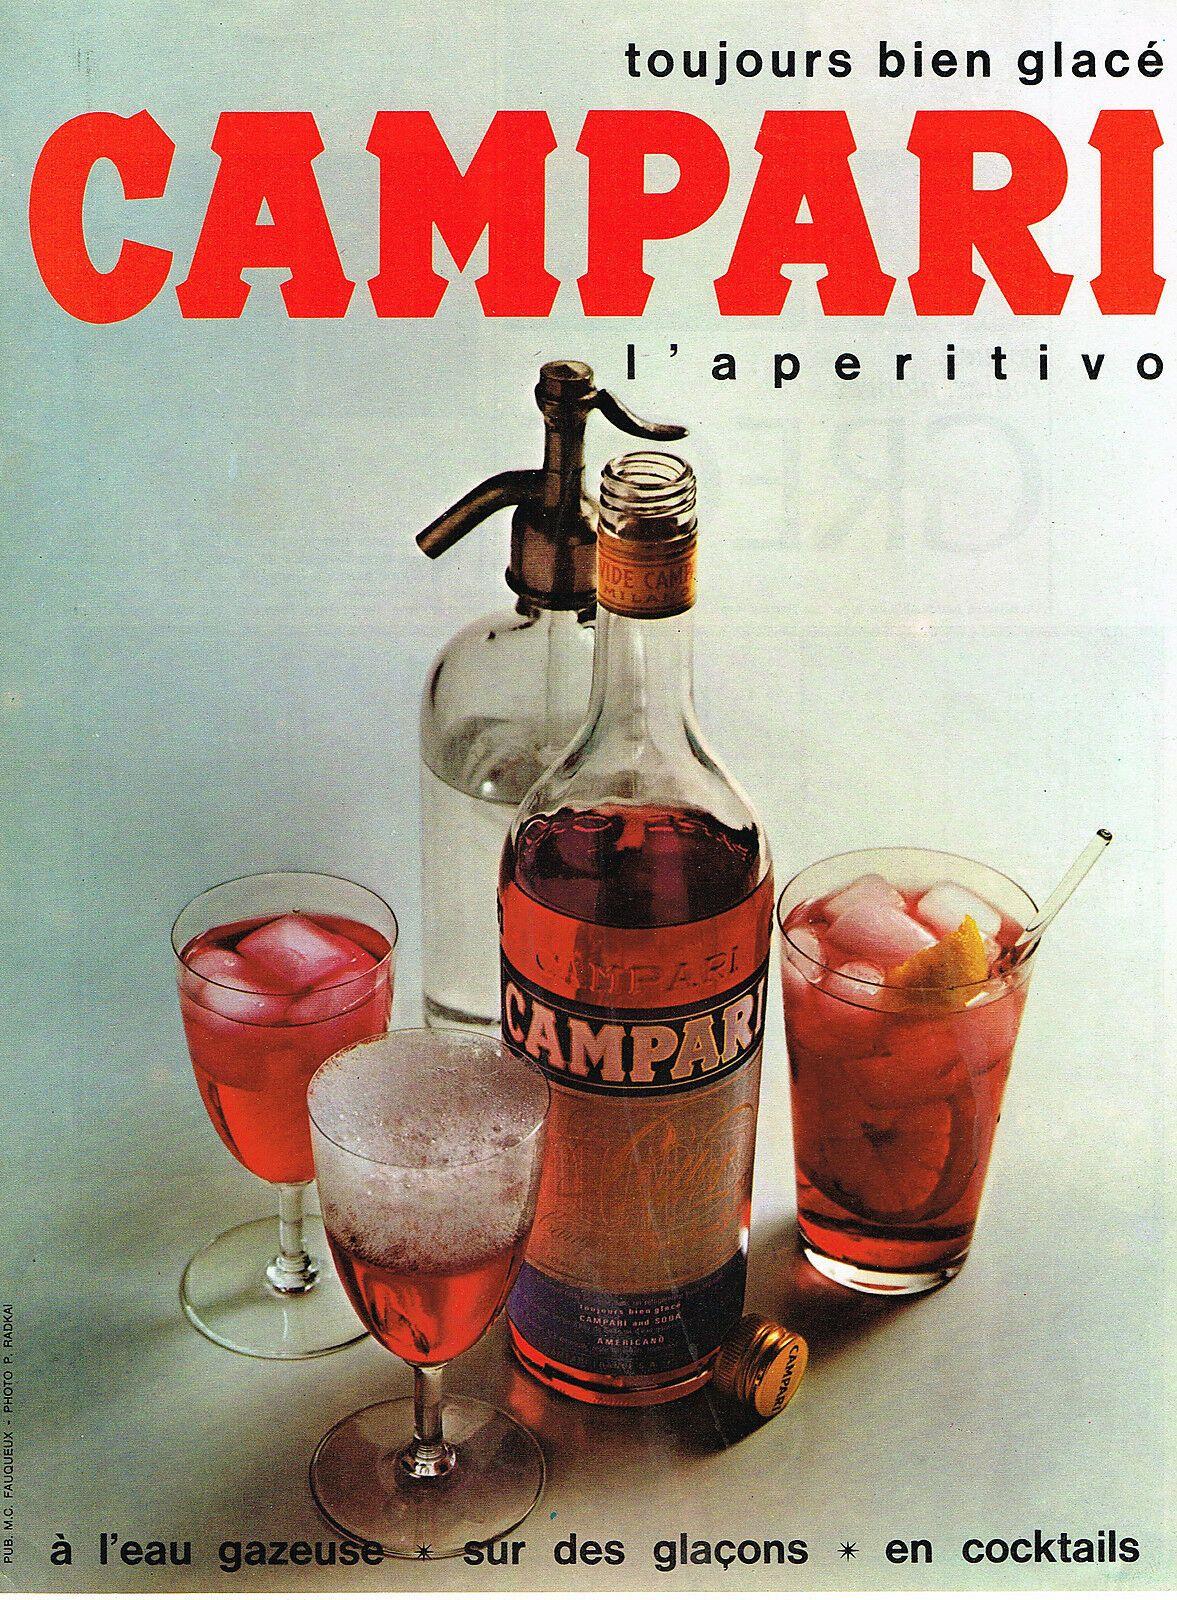 Vintage Italian Campari Color Print Advertisement Featuring A Bottle Of Campari Soda Bottle And Three Glasse In 2020 Campari Cocktails Vintage Advertisements Campari